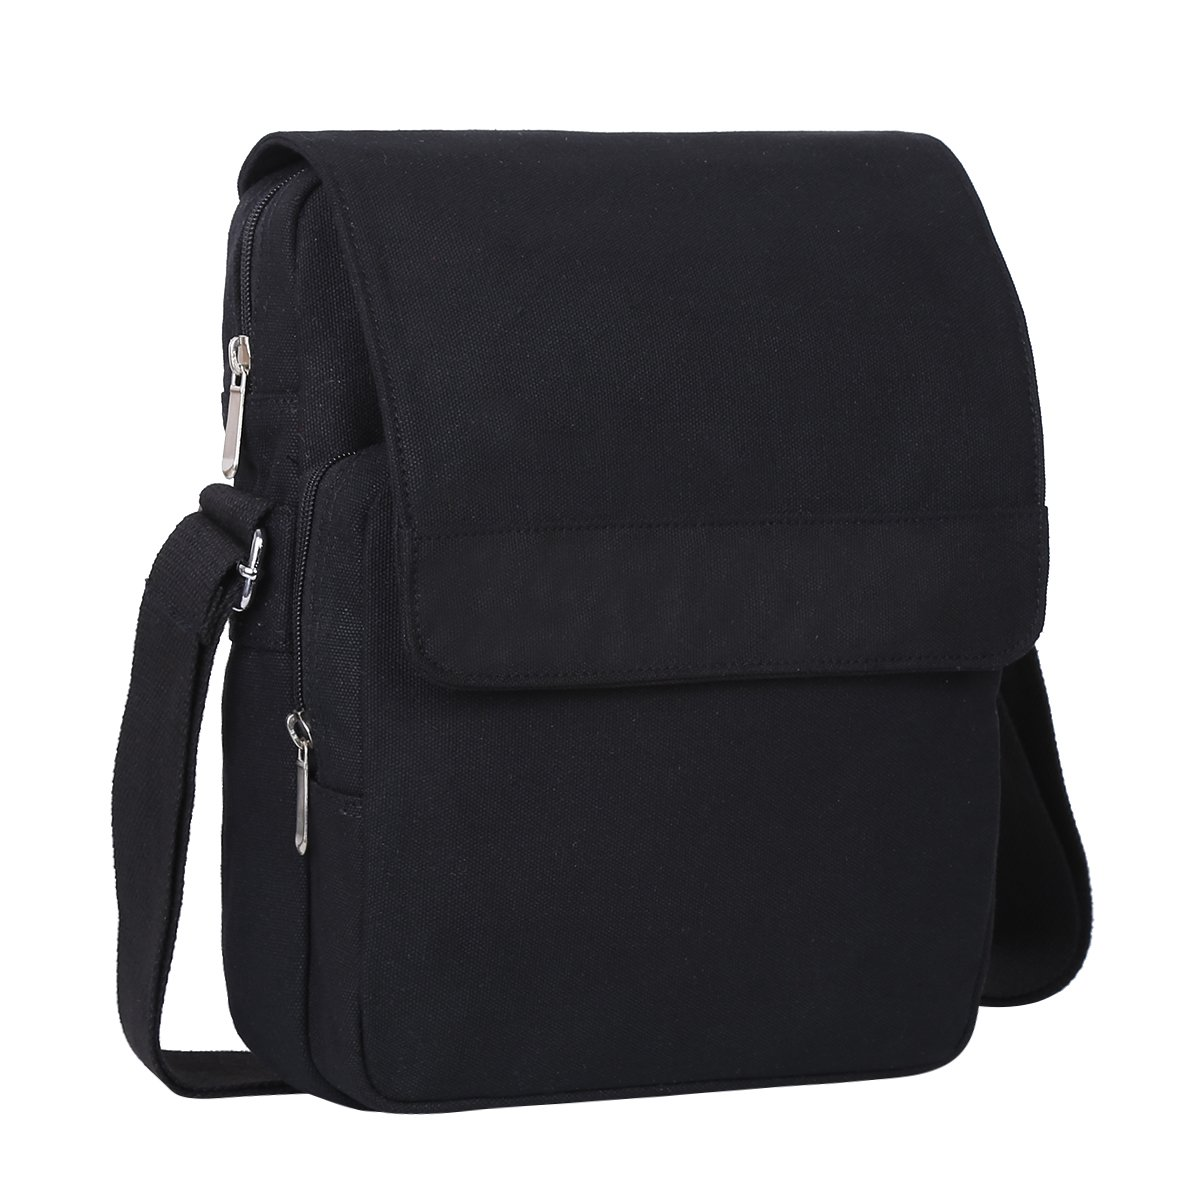 Eshow Mens Canvas Shoulder Bag Messenger Bag Chest Bag Fanny Purse Crossbody Bag for Men Satchel Travel Bag School bags